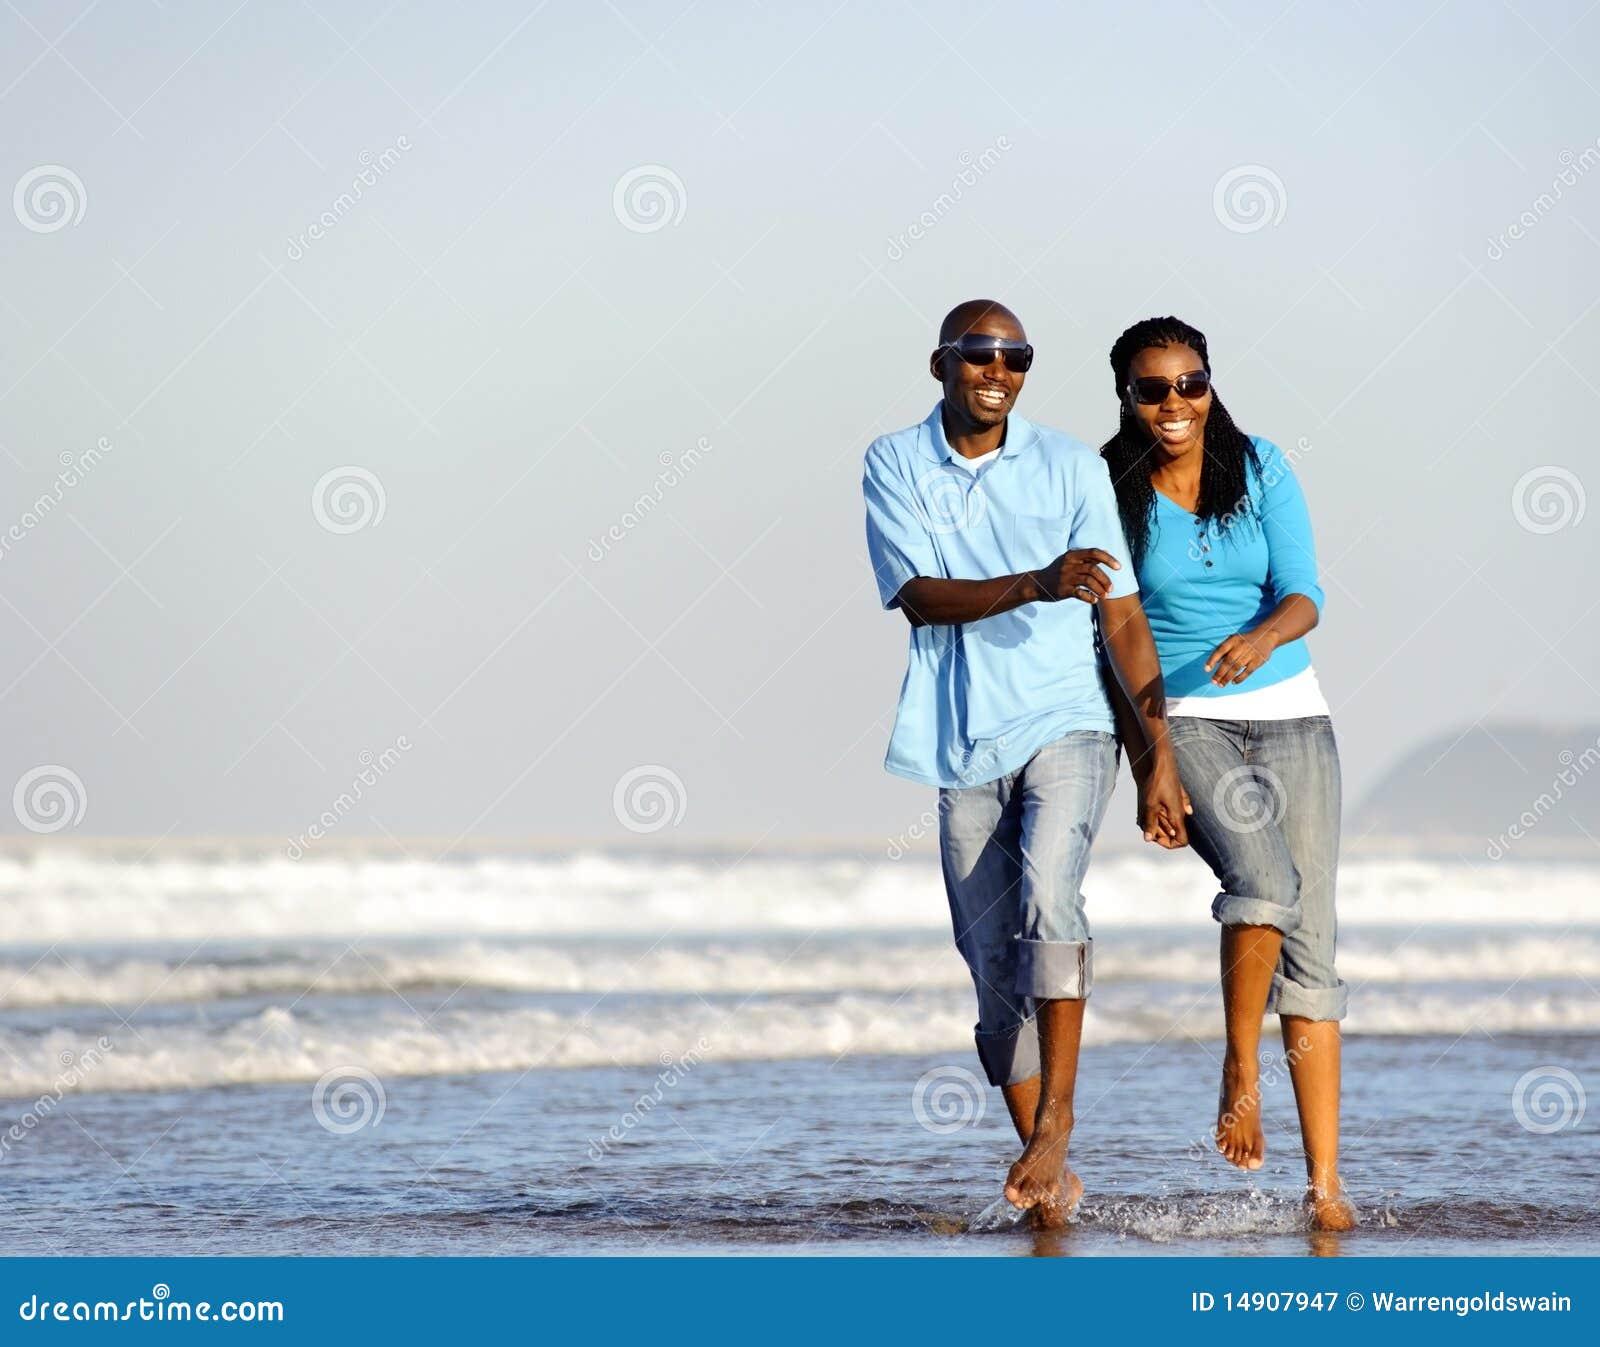 Happy Walking Couple Stock Image. Image Of Sunglasses